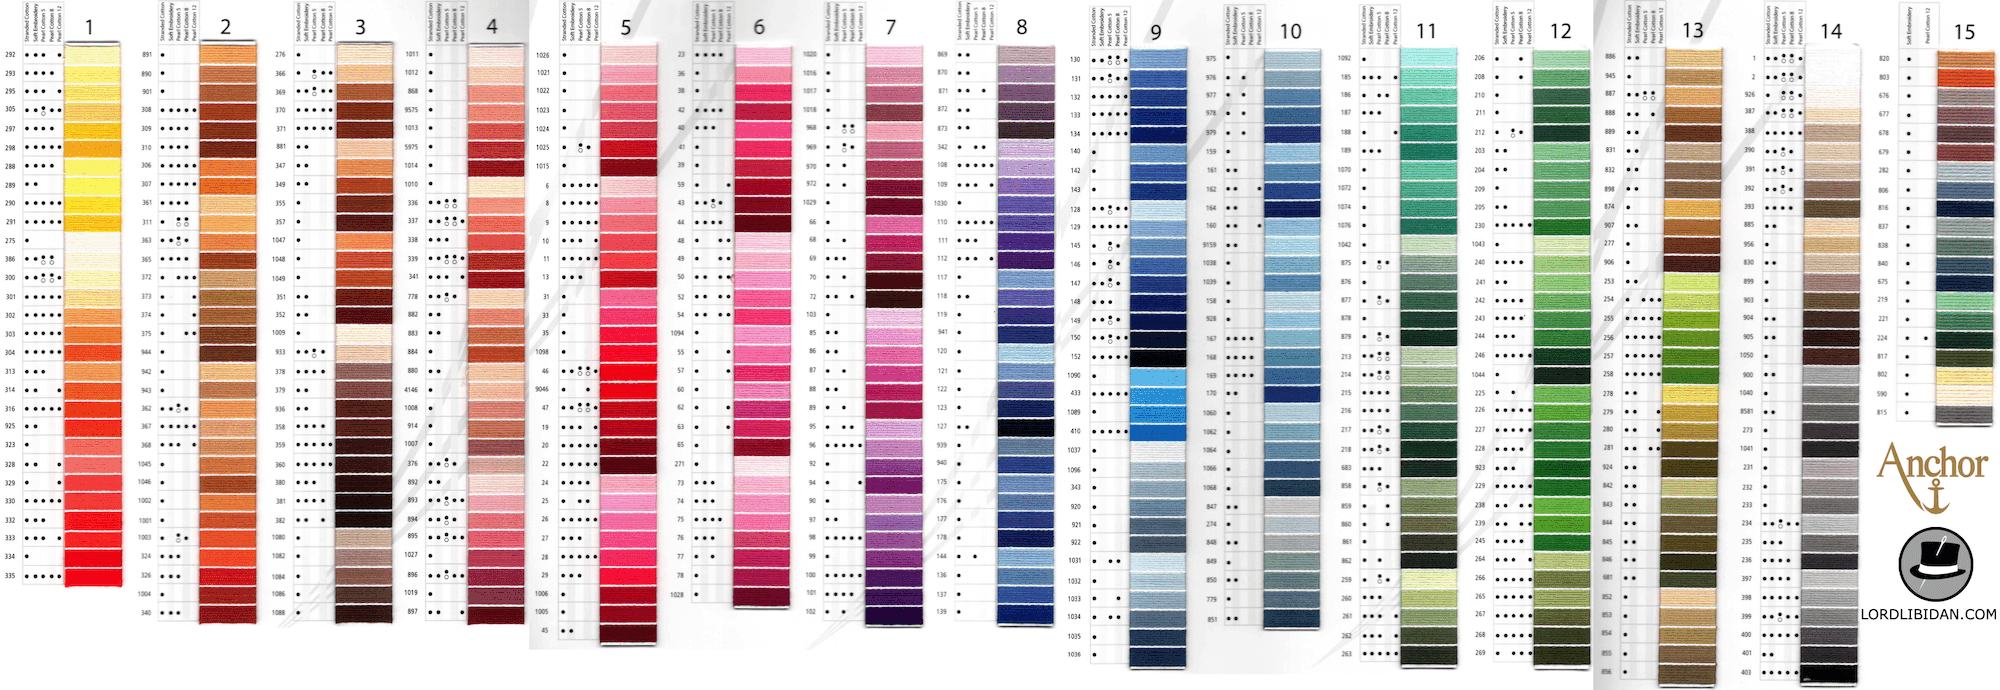 ANCHOR Cotton Ball Skien Crochet Thread Shade Card Chart Book Solid /& Variegated